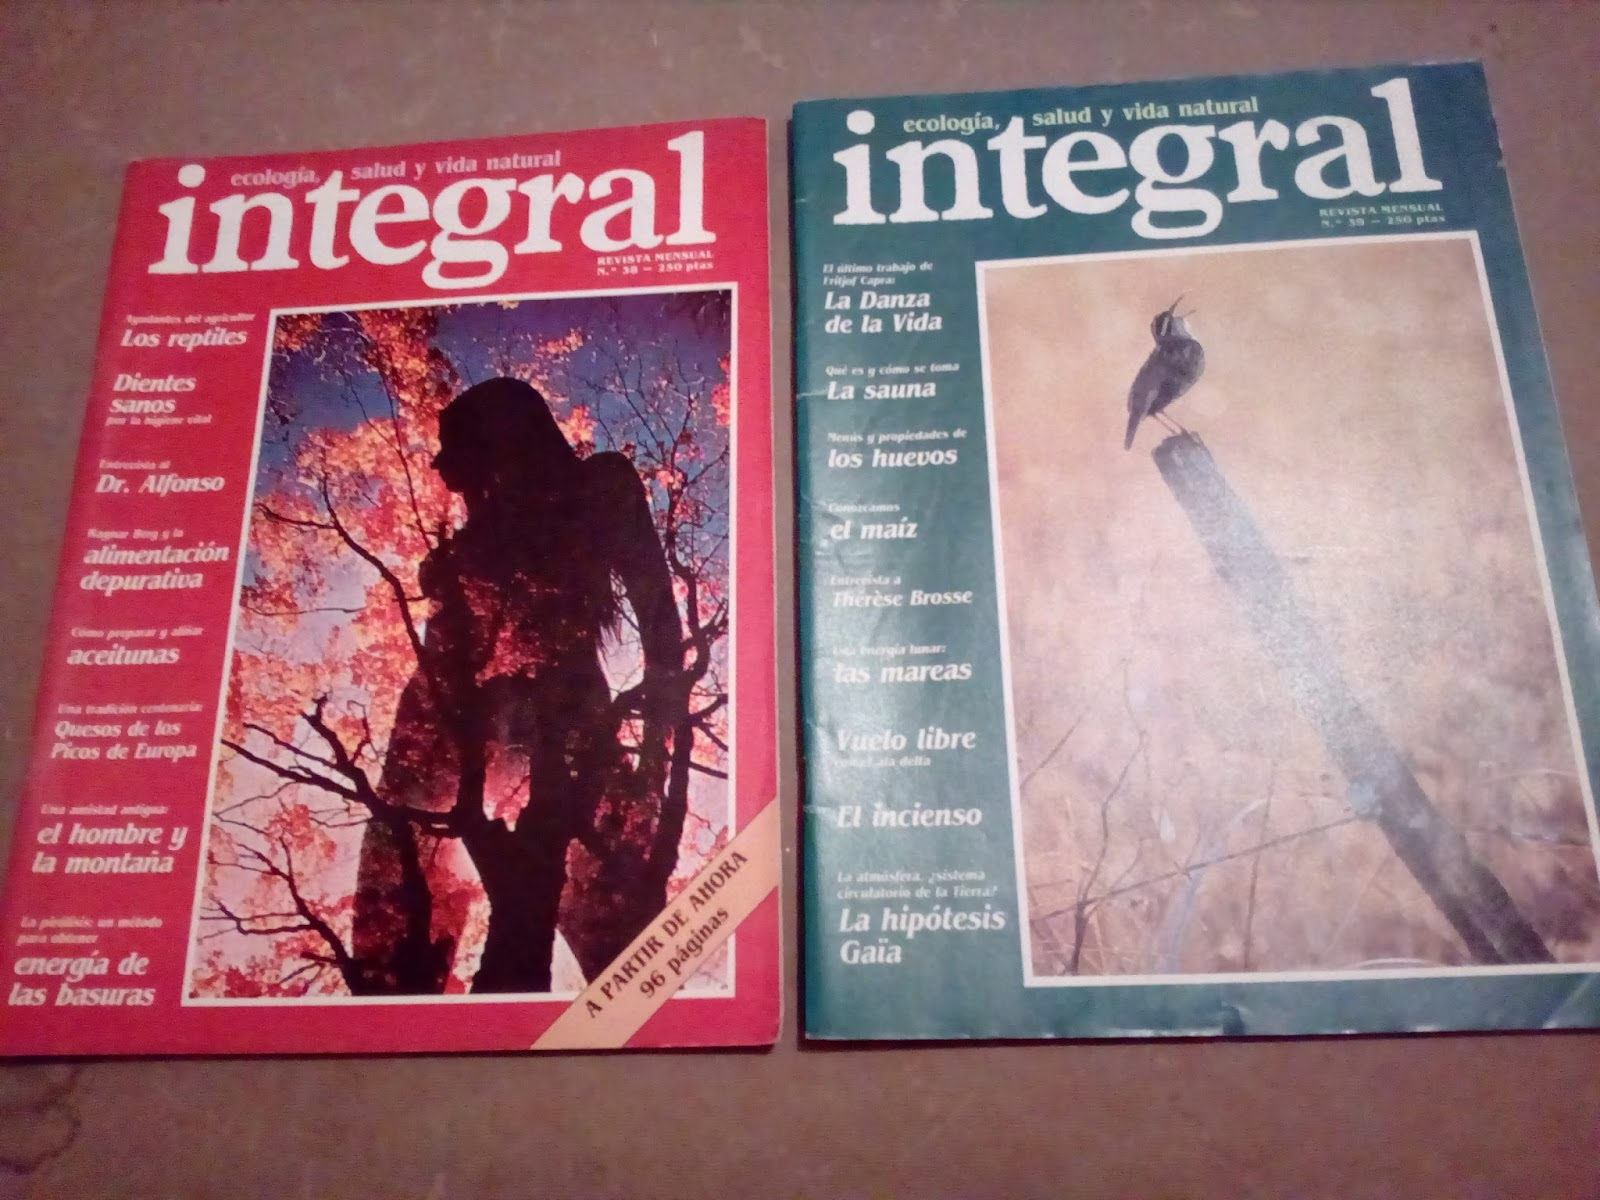 O desv n vintage do pereiro revistas integral - Desvan vintage ...